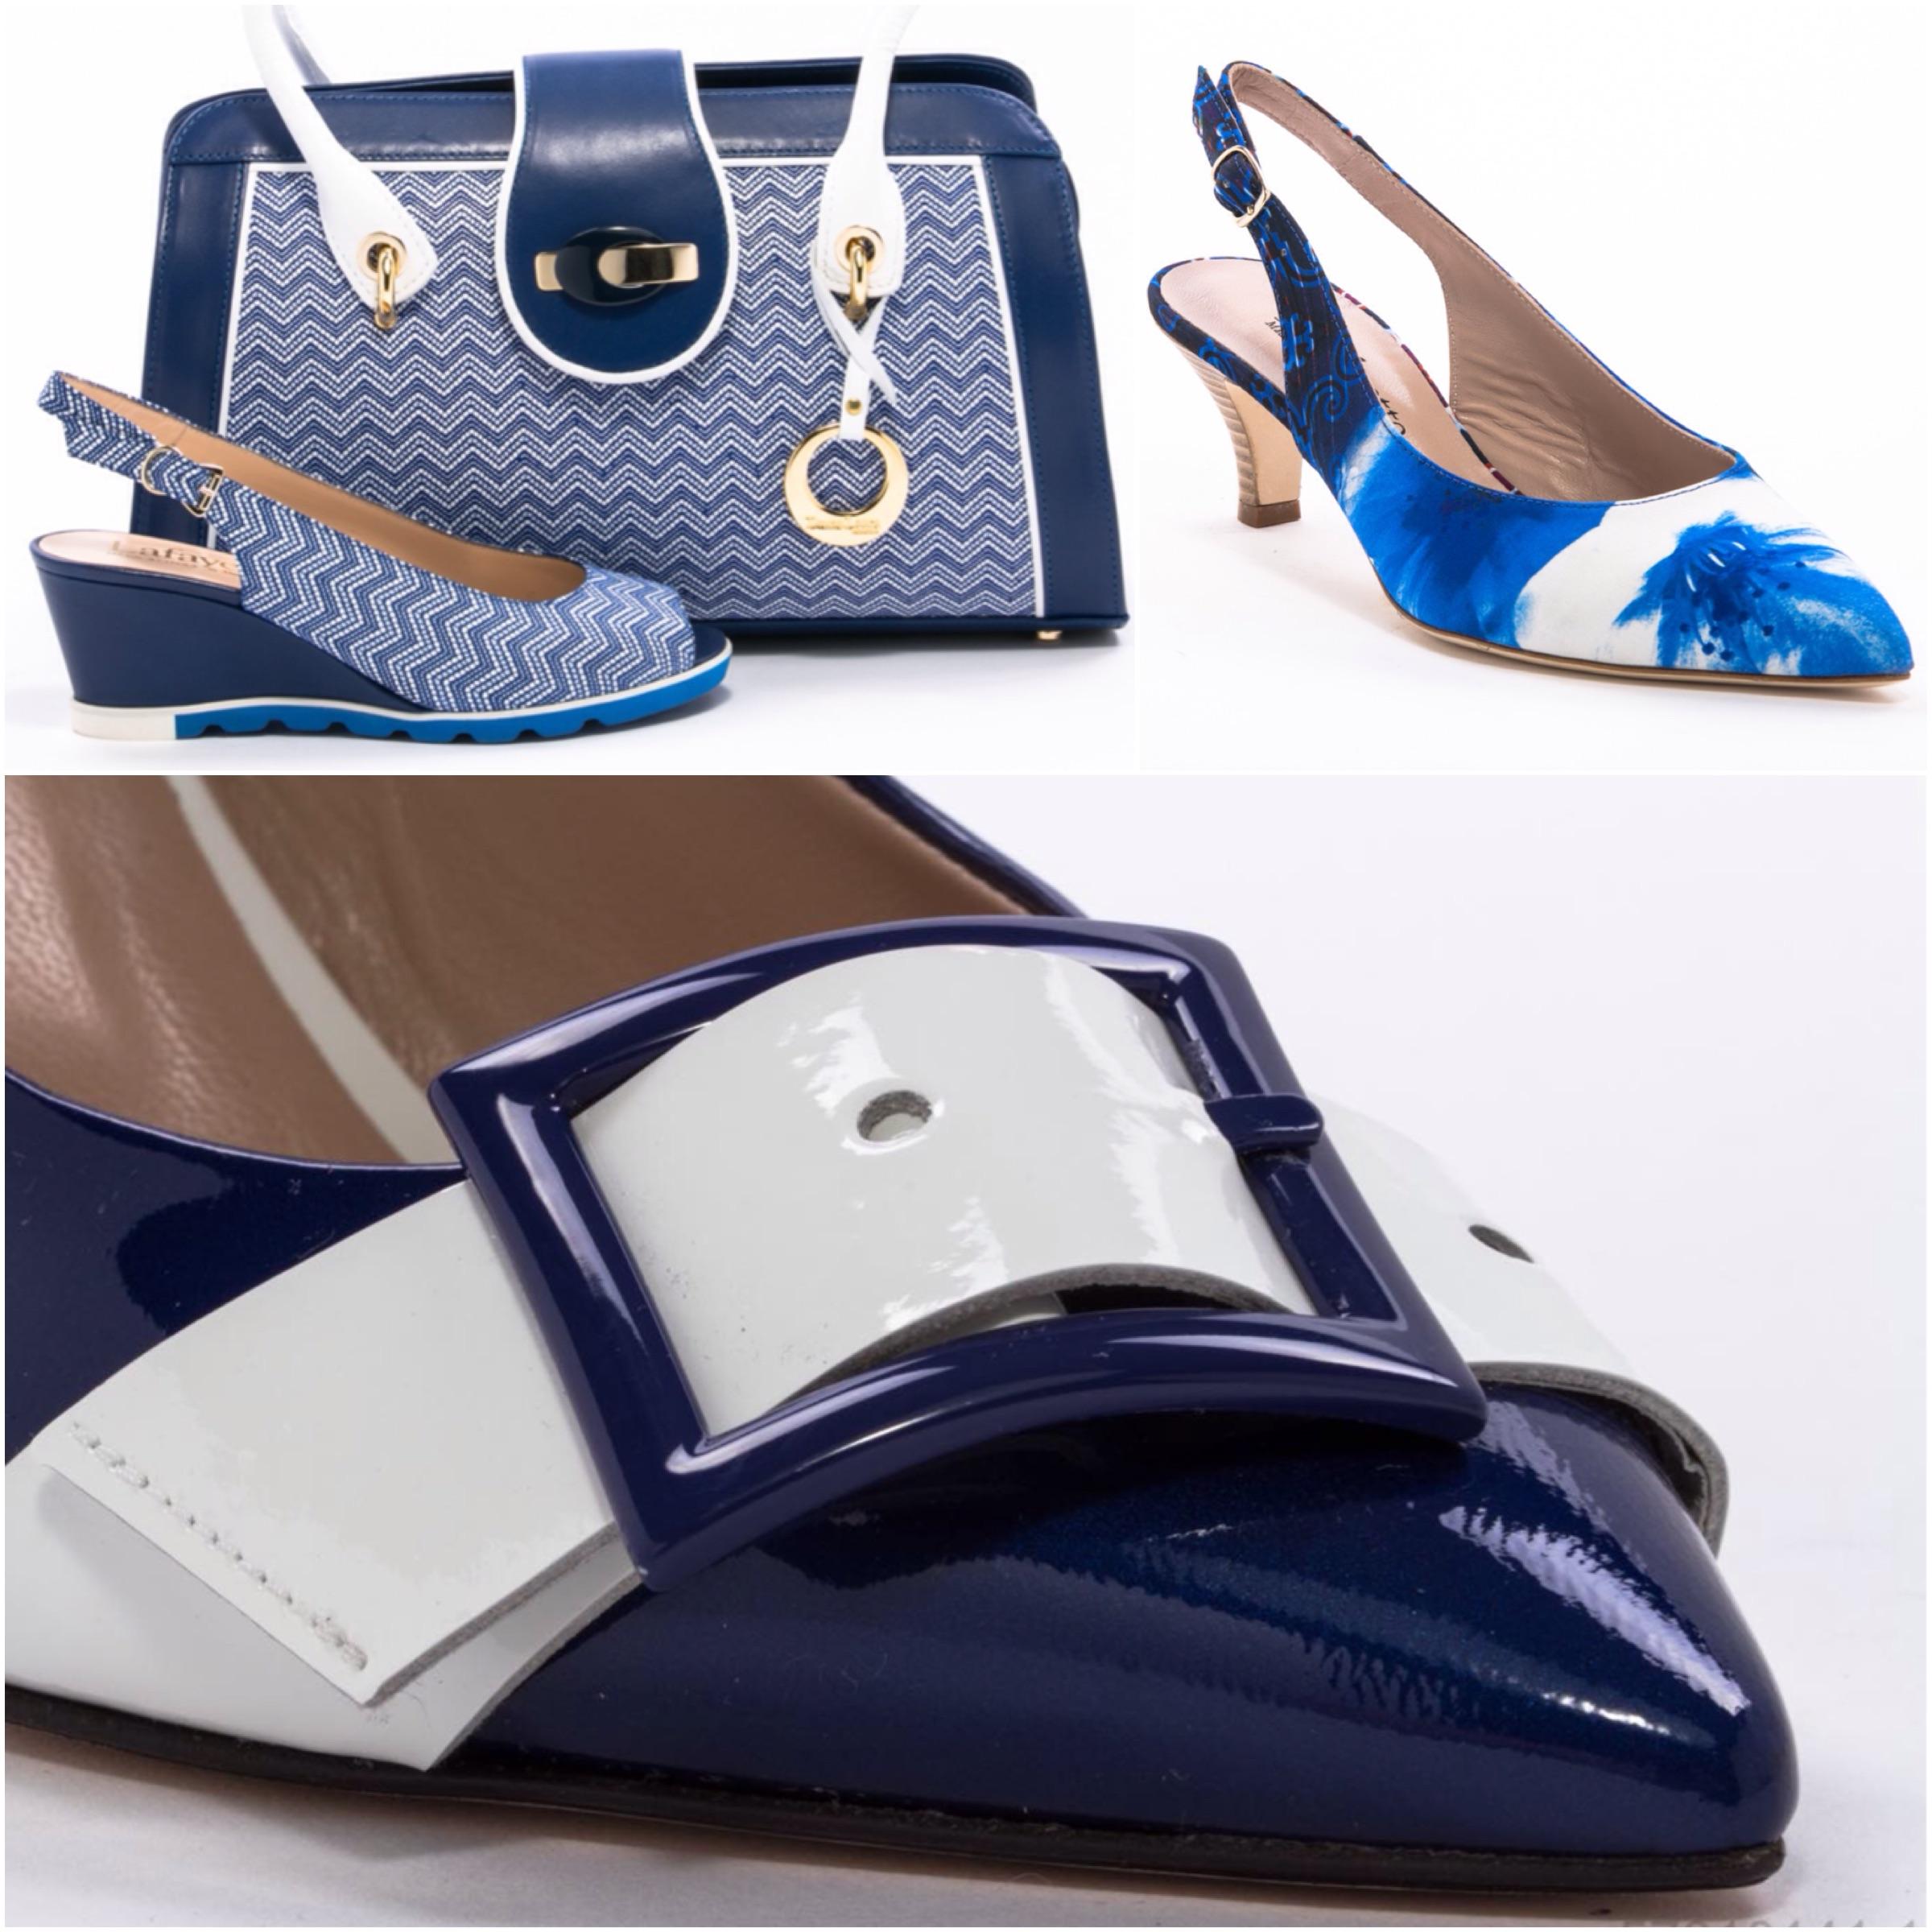 Lafayette Italy: бело-голубая коллекция обуви и сумок ко Дню Независимости Израиля